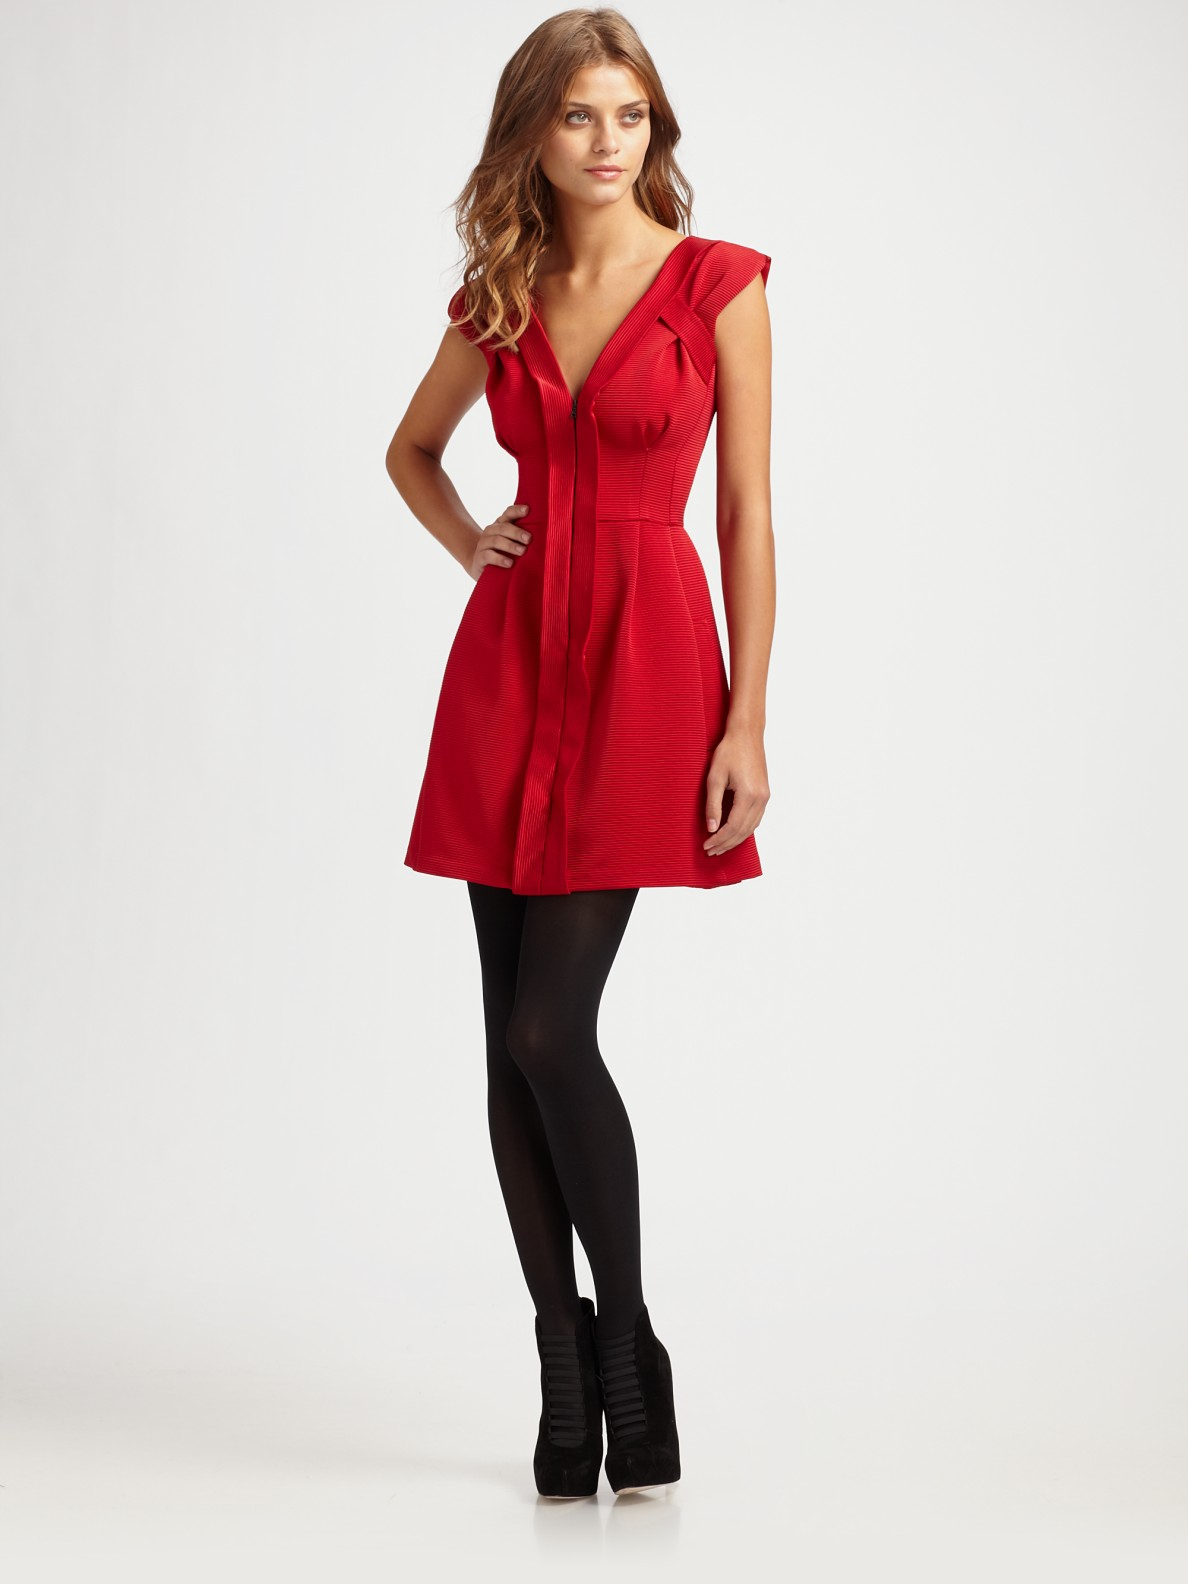 Lepore Red Dress